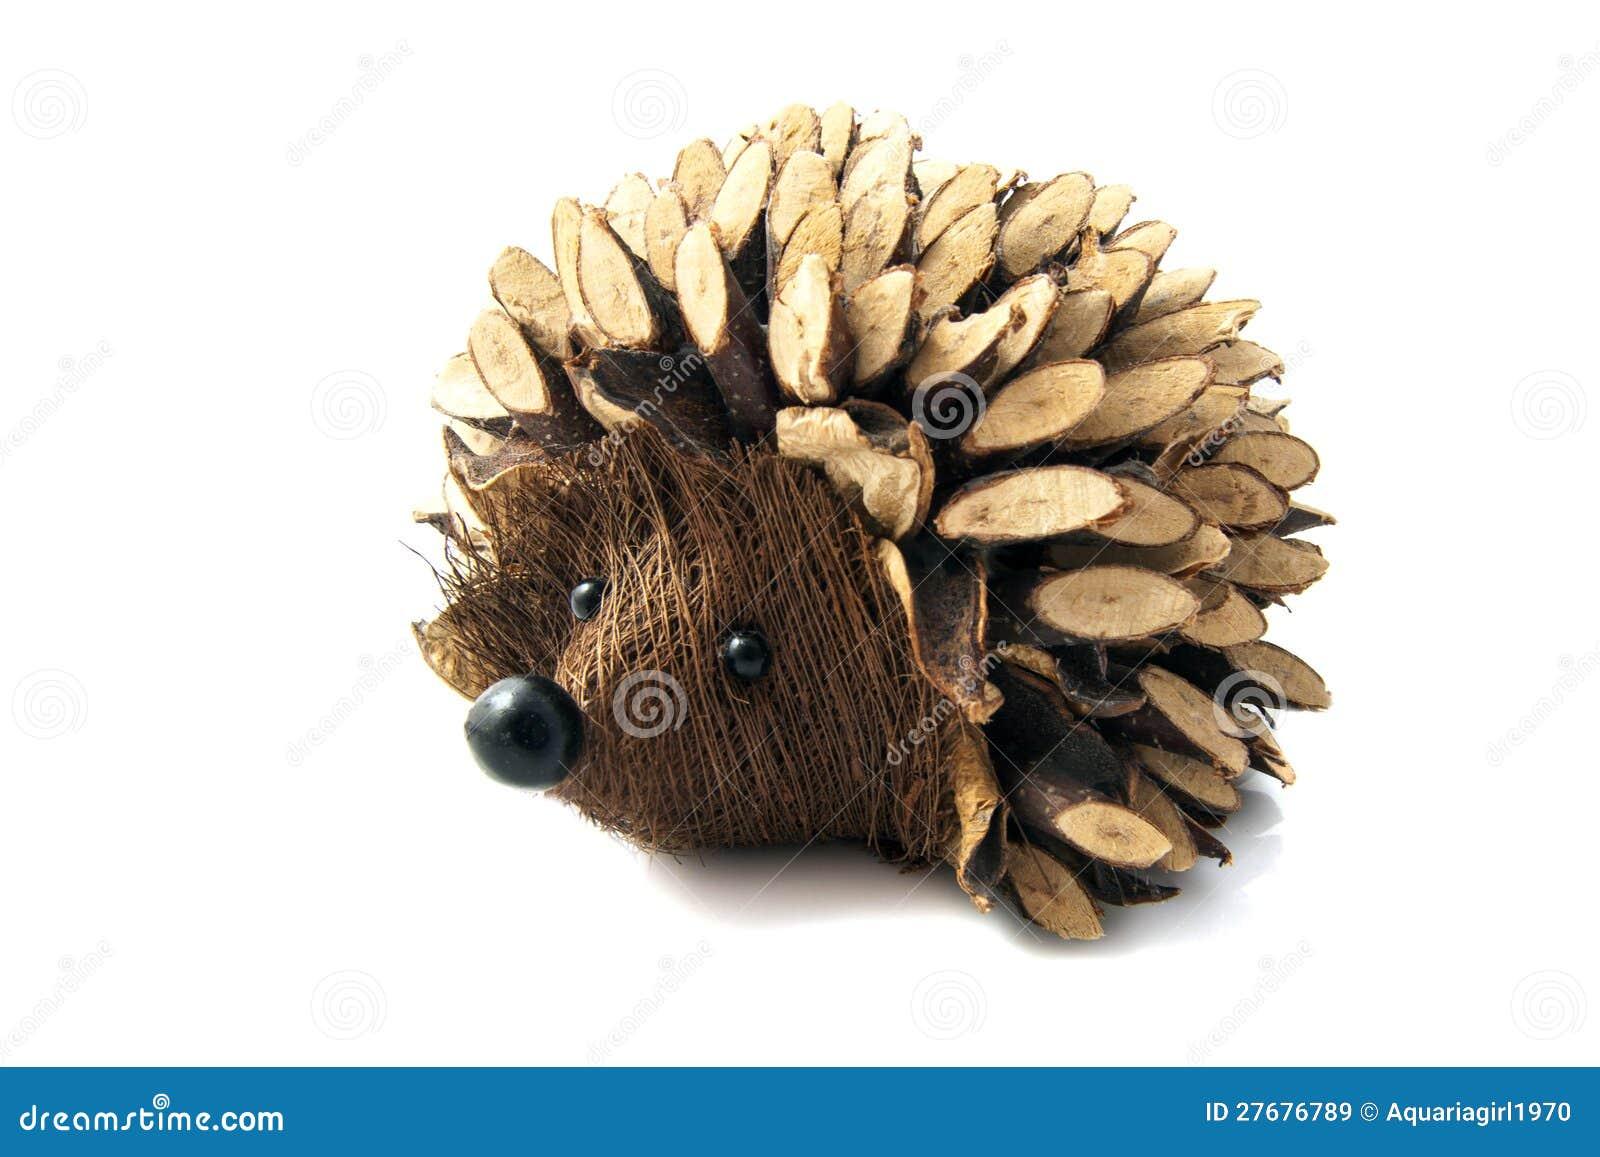 Wooden Handmade Hedgehog Royalty Free Stock Images - Image: 27676789